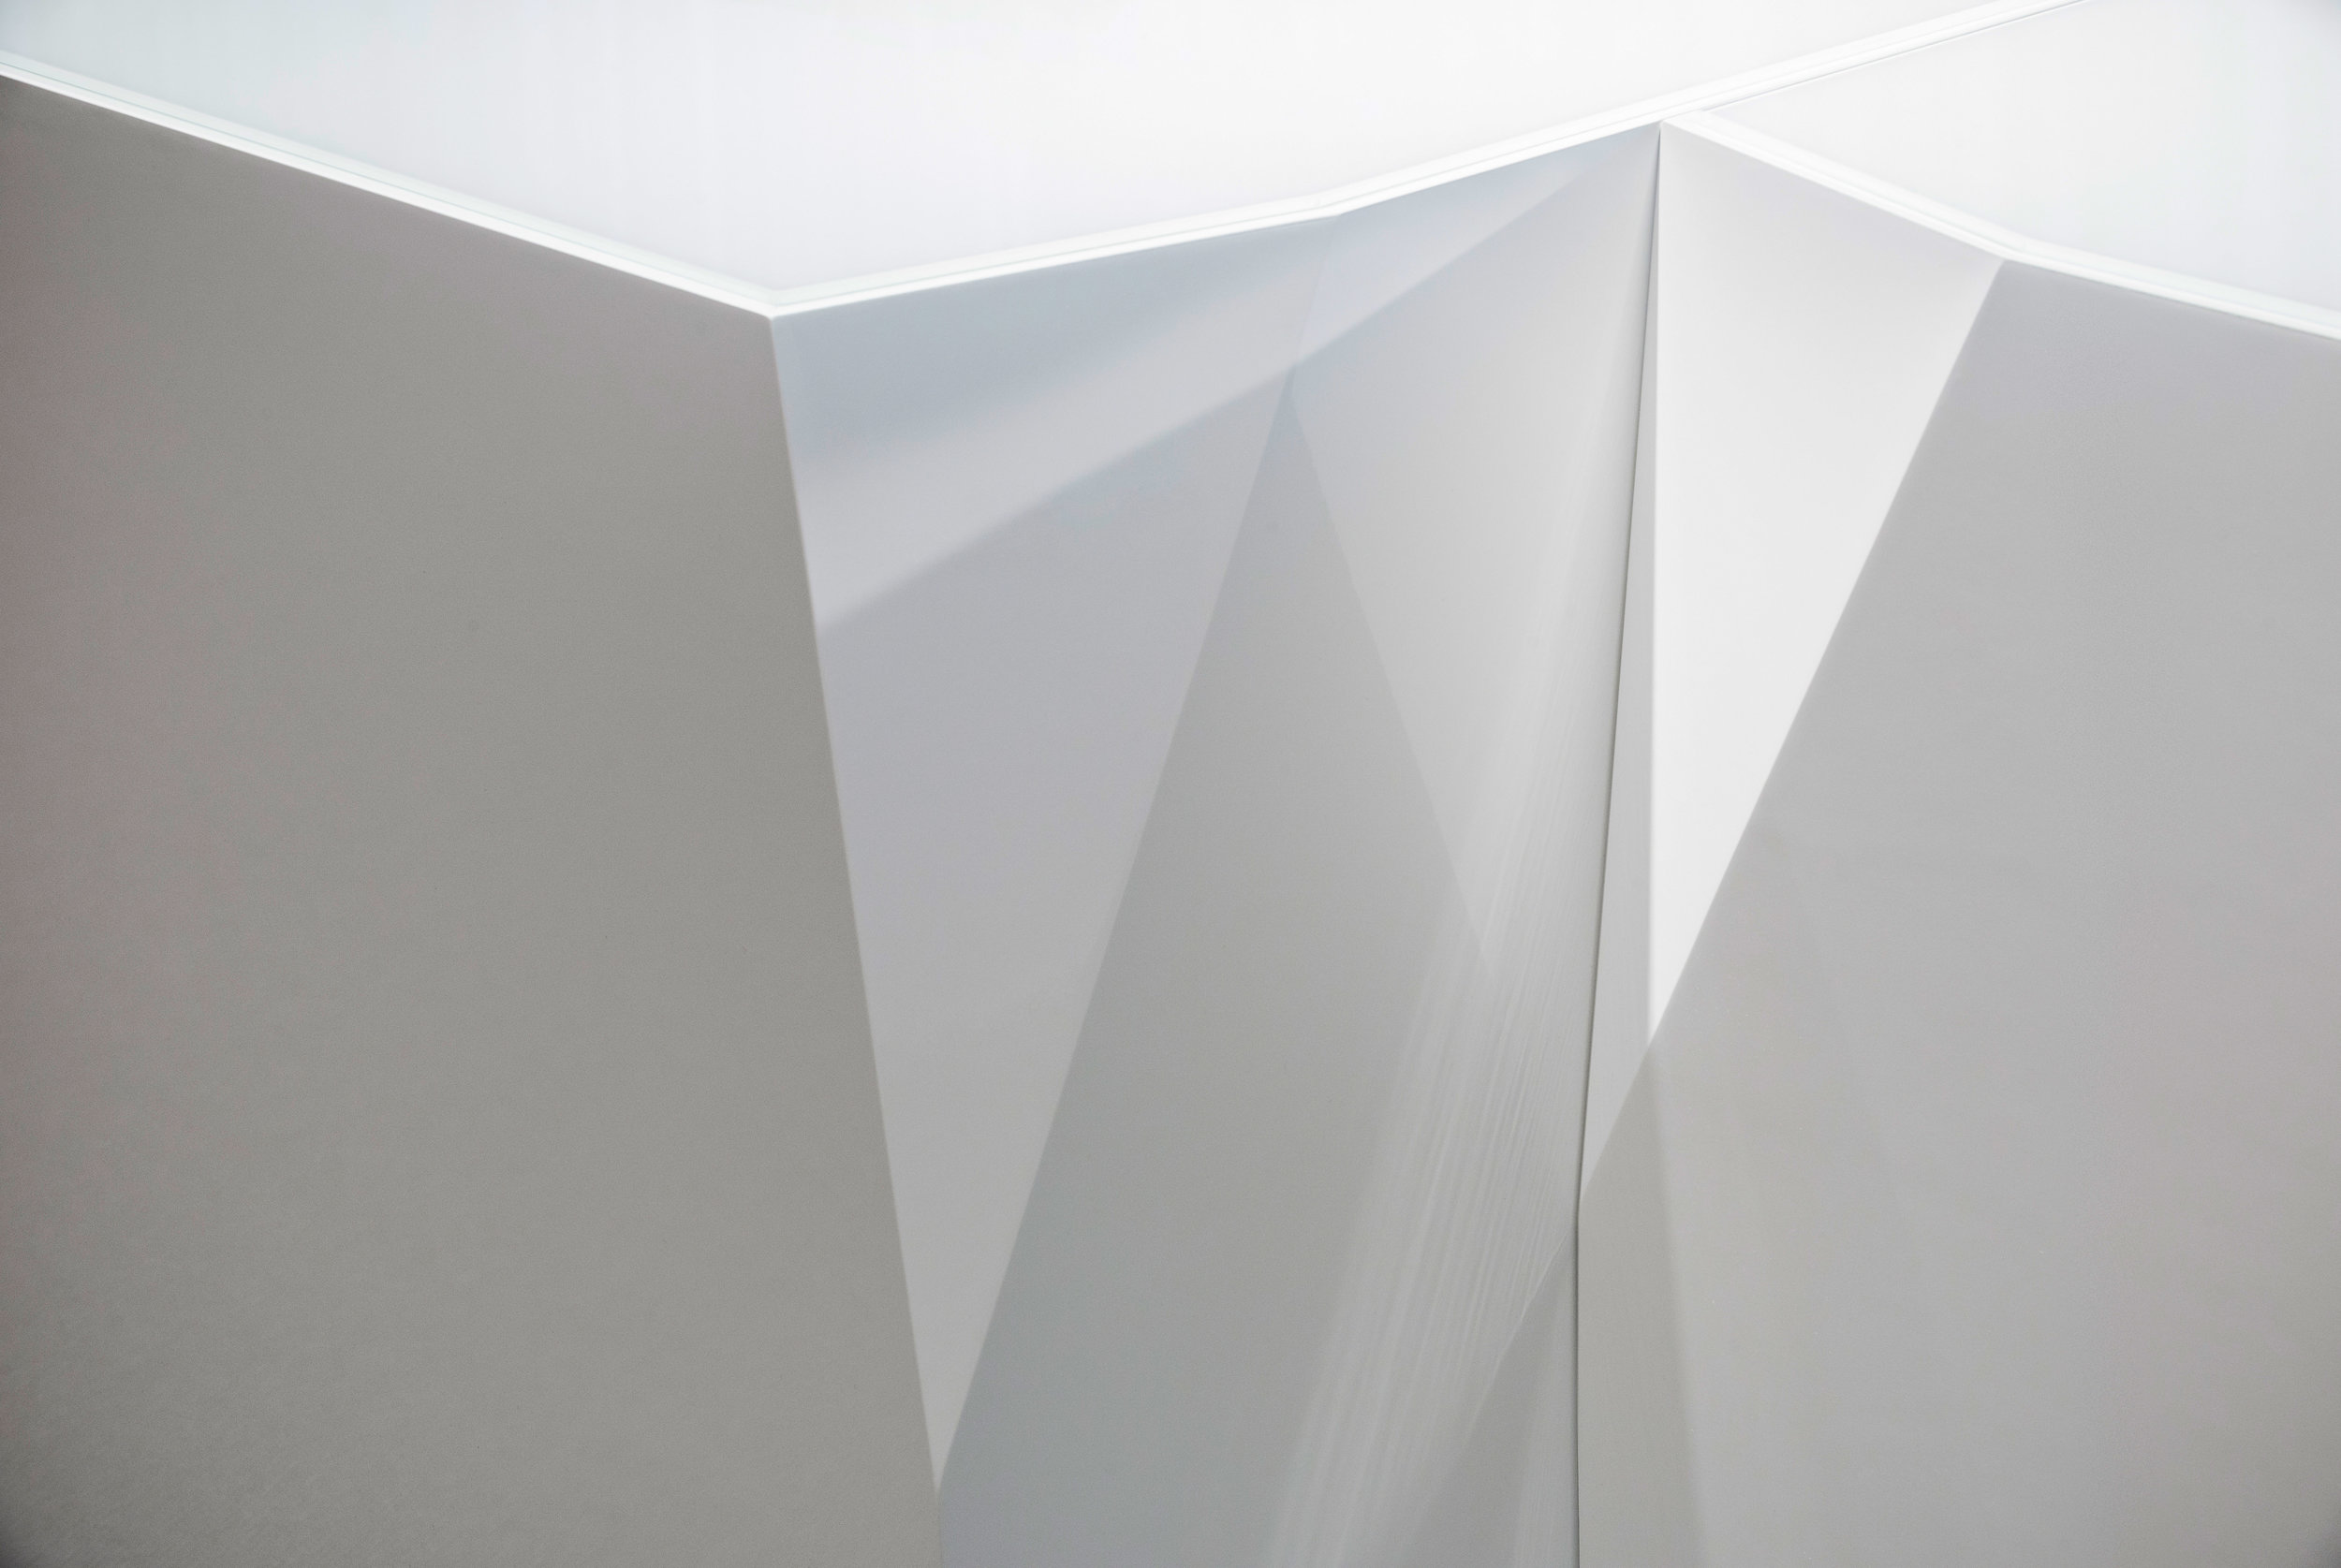 microsoft-center_coorporate-interior-design_coordination-berlin_12.jpg